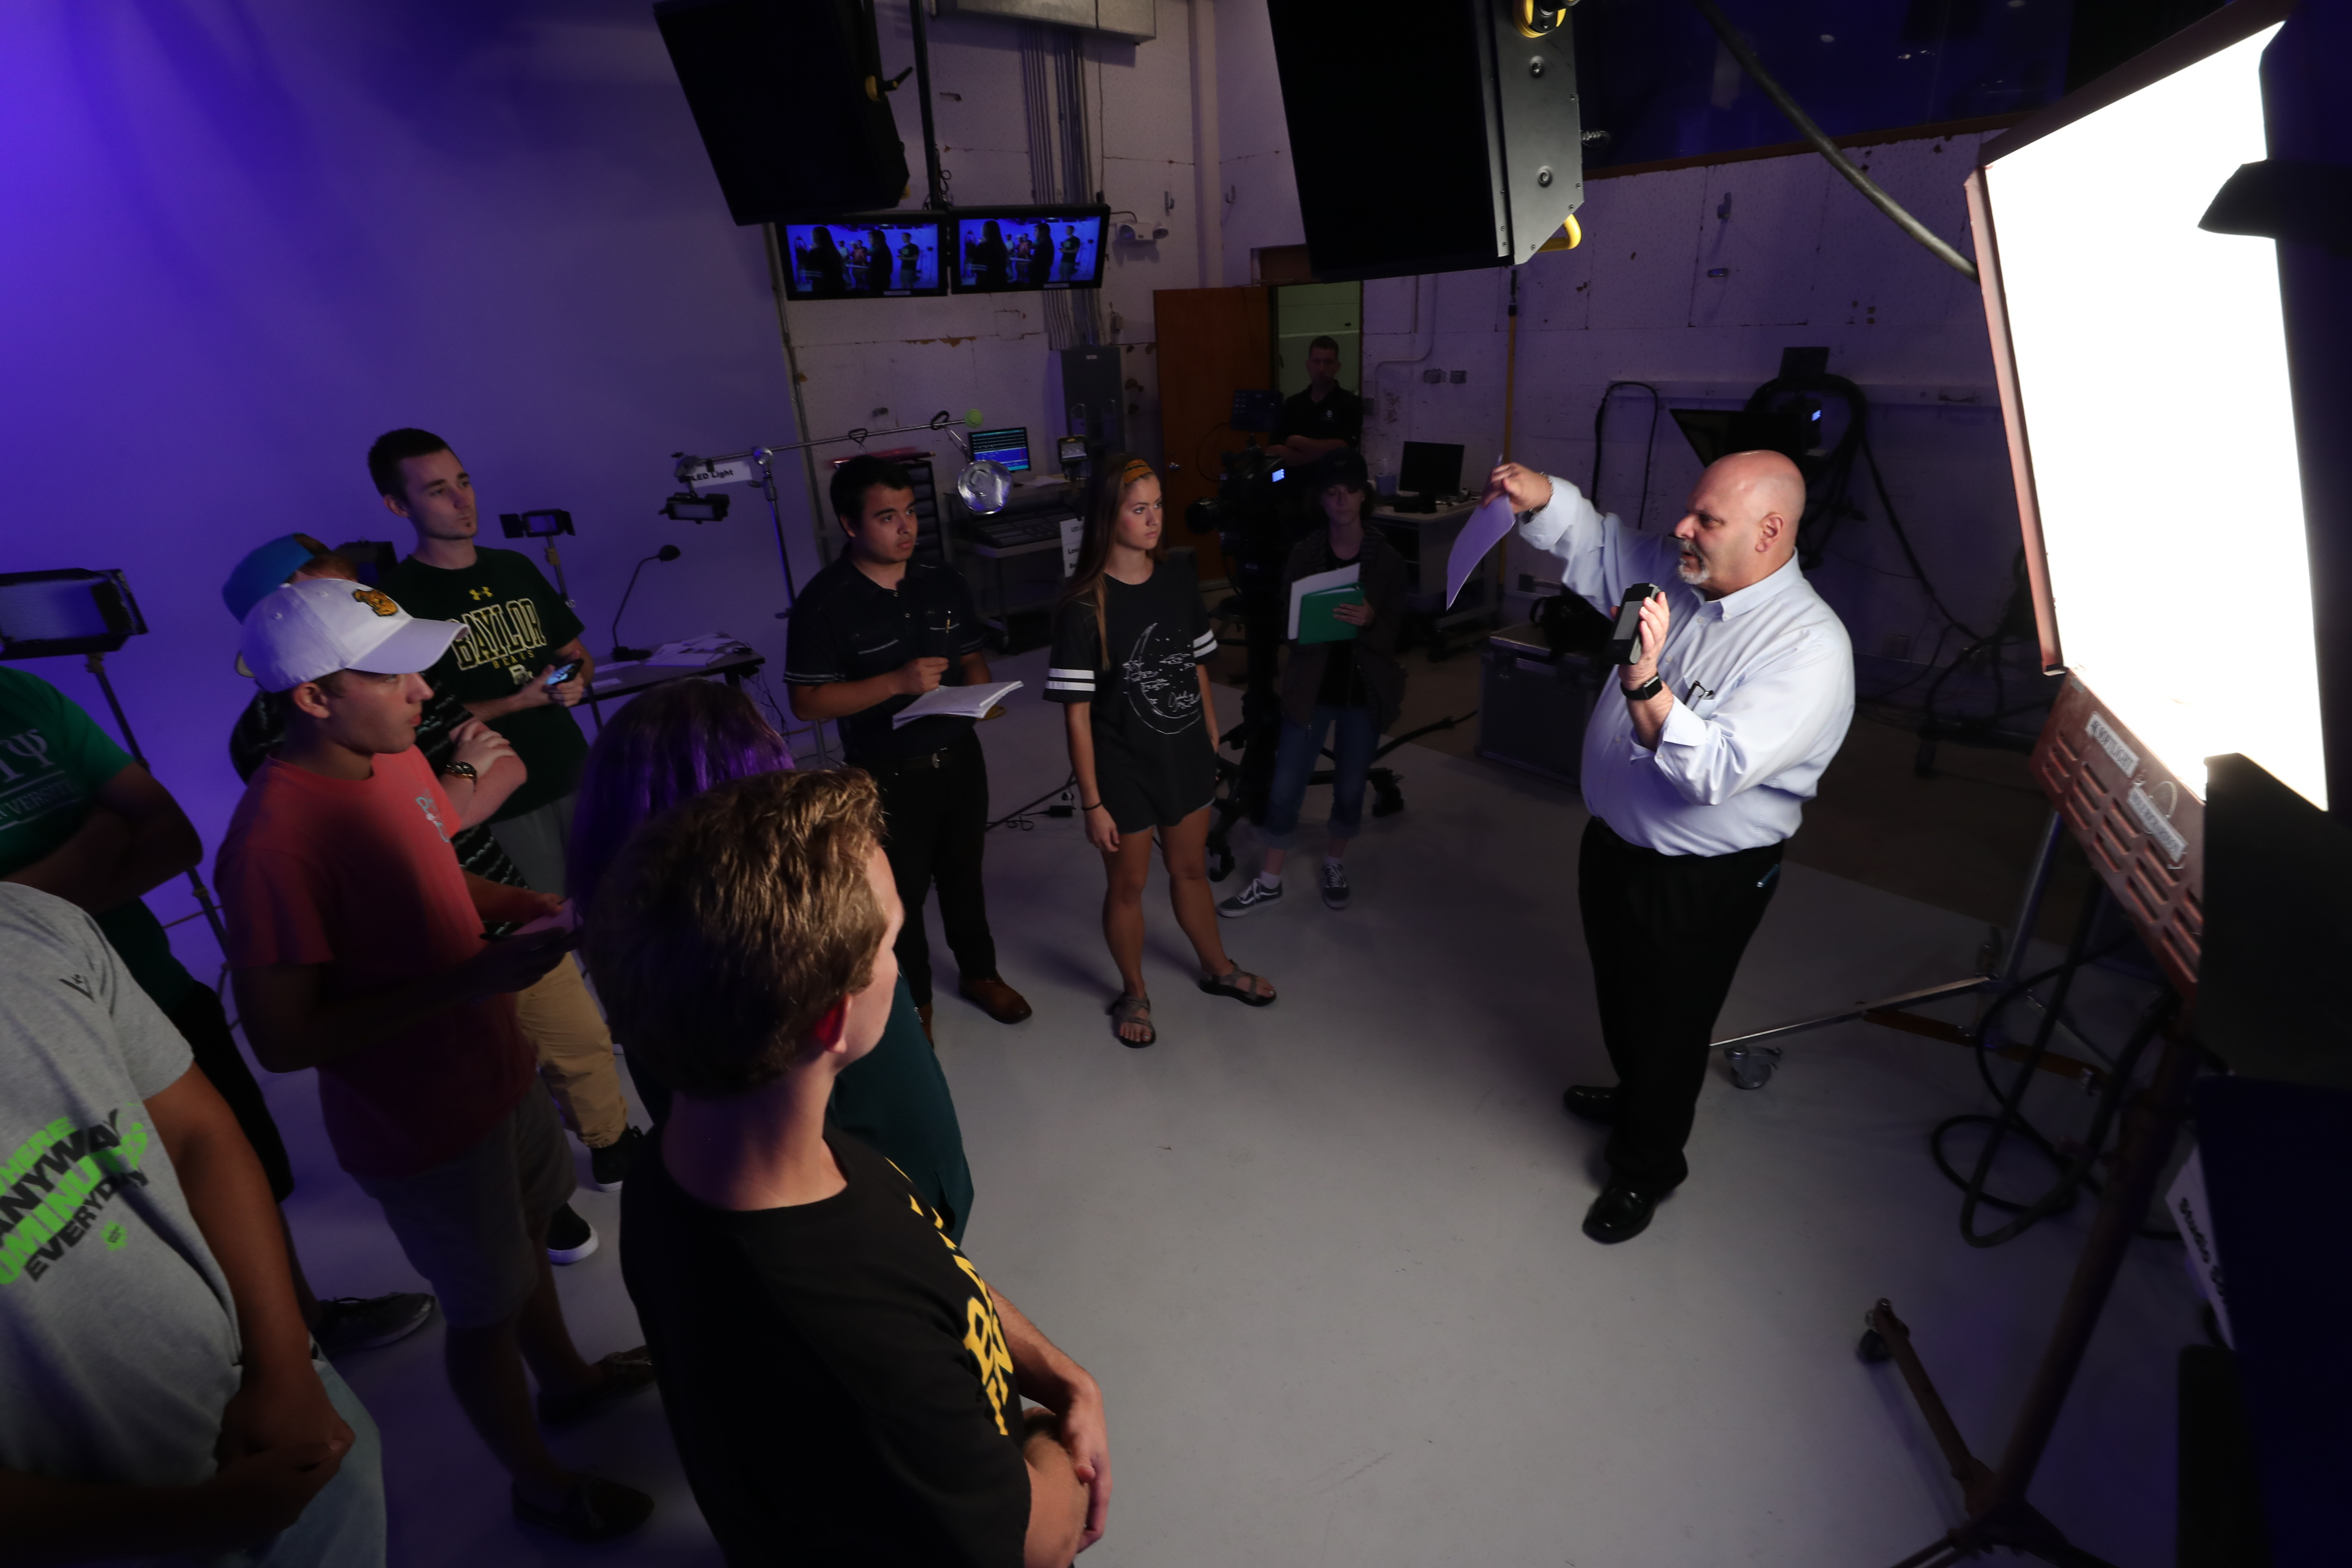 A professor guides students in a studio